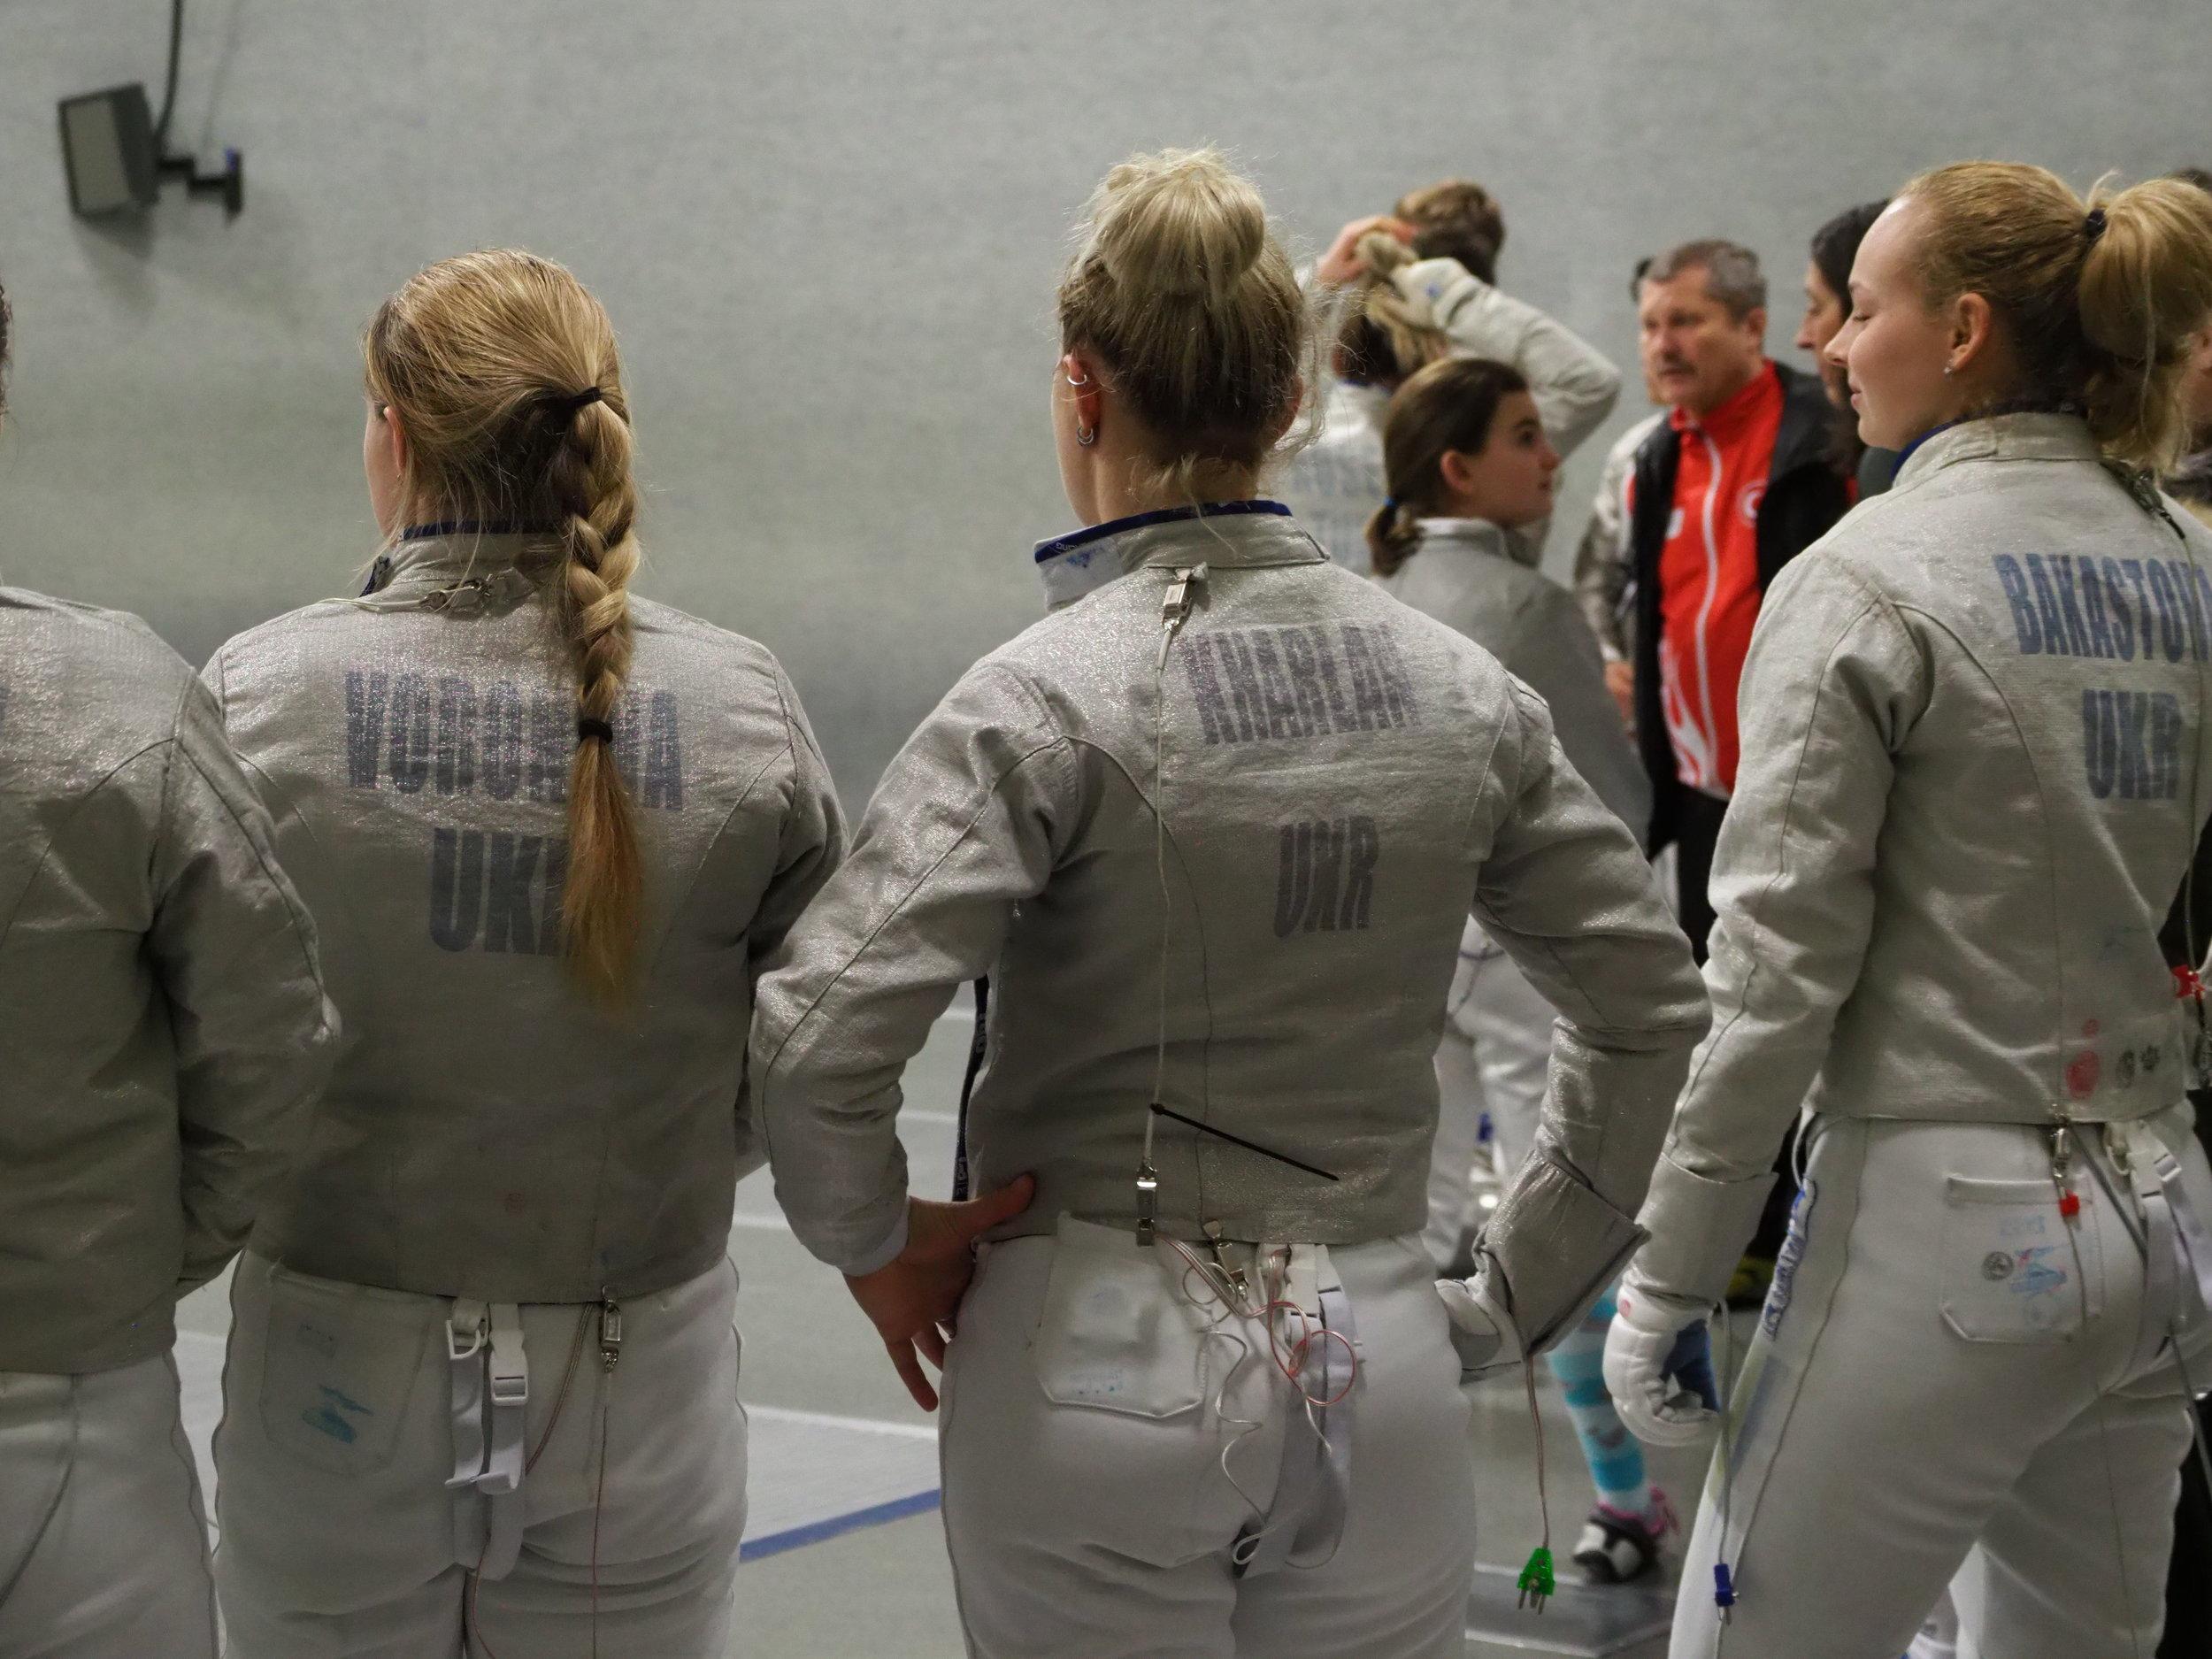 Three-time World Champion Olga Kharlan was among the fencers at the OFA Progressive.